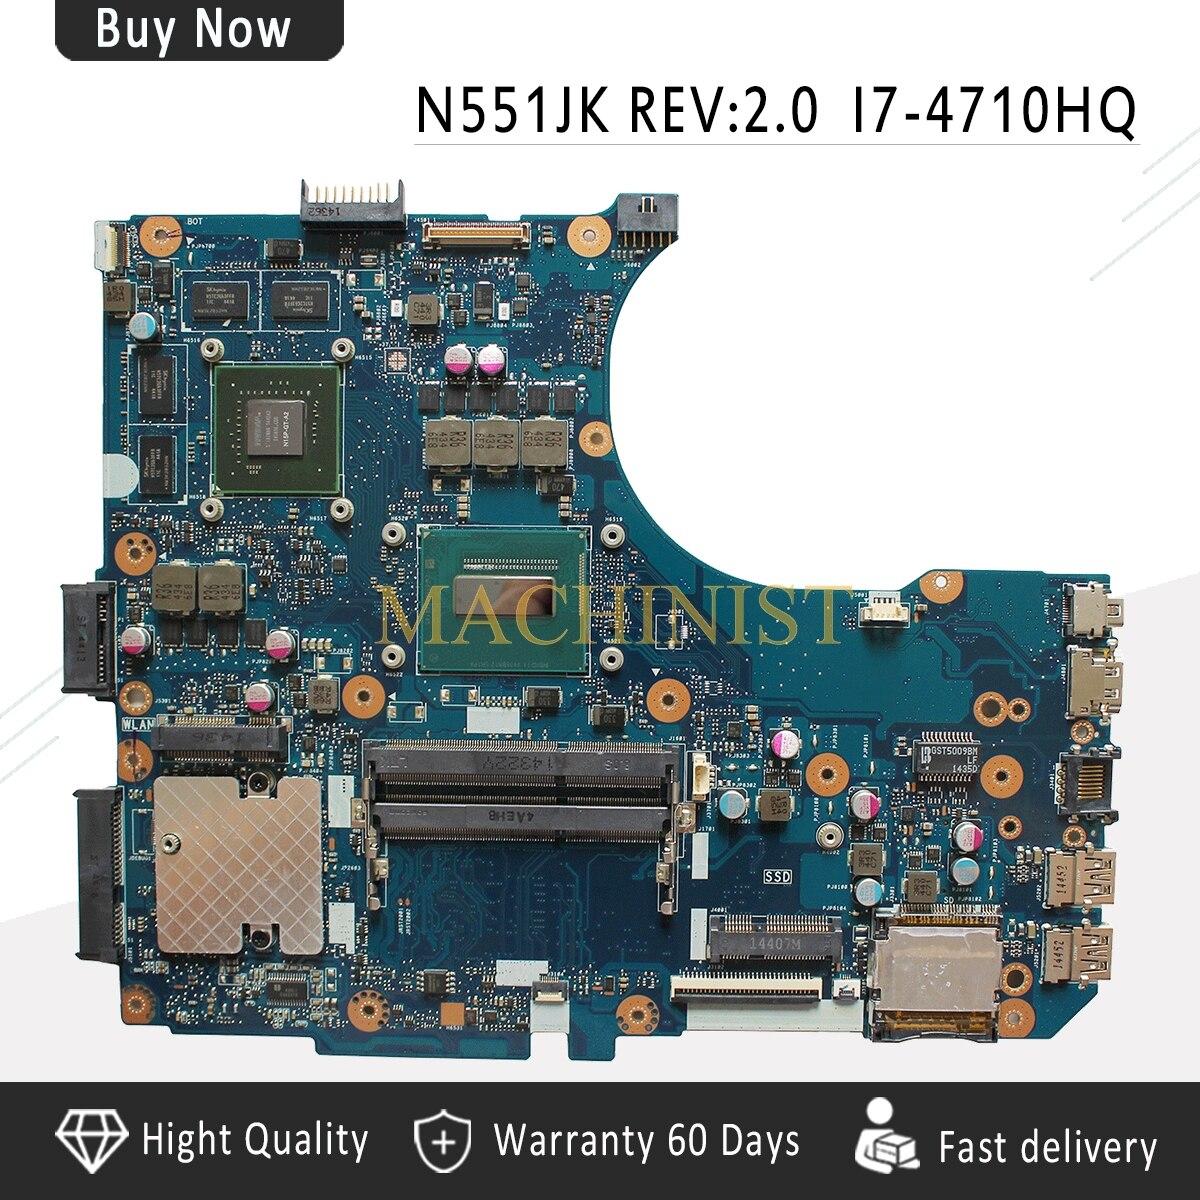 N551JK motherboard  For ASUS G551JM N551J N551JM N551JW N551JW N551JQ N551JX N551JK laptop motherboard REV 2.0 I7-4710HQN551JK motherboard  For ASUS G551JM N551J N551JM N551JW N551JW N551JQ N551JX N551JK laptop motherboard REV 2.0 I7-4710HQ